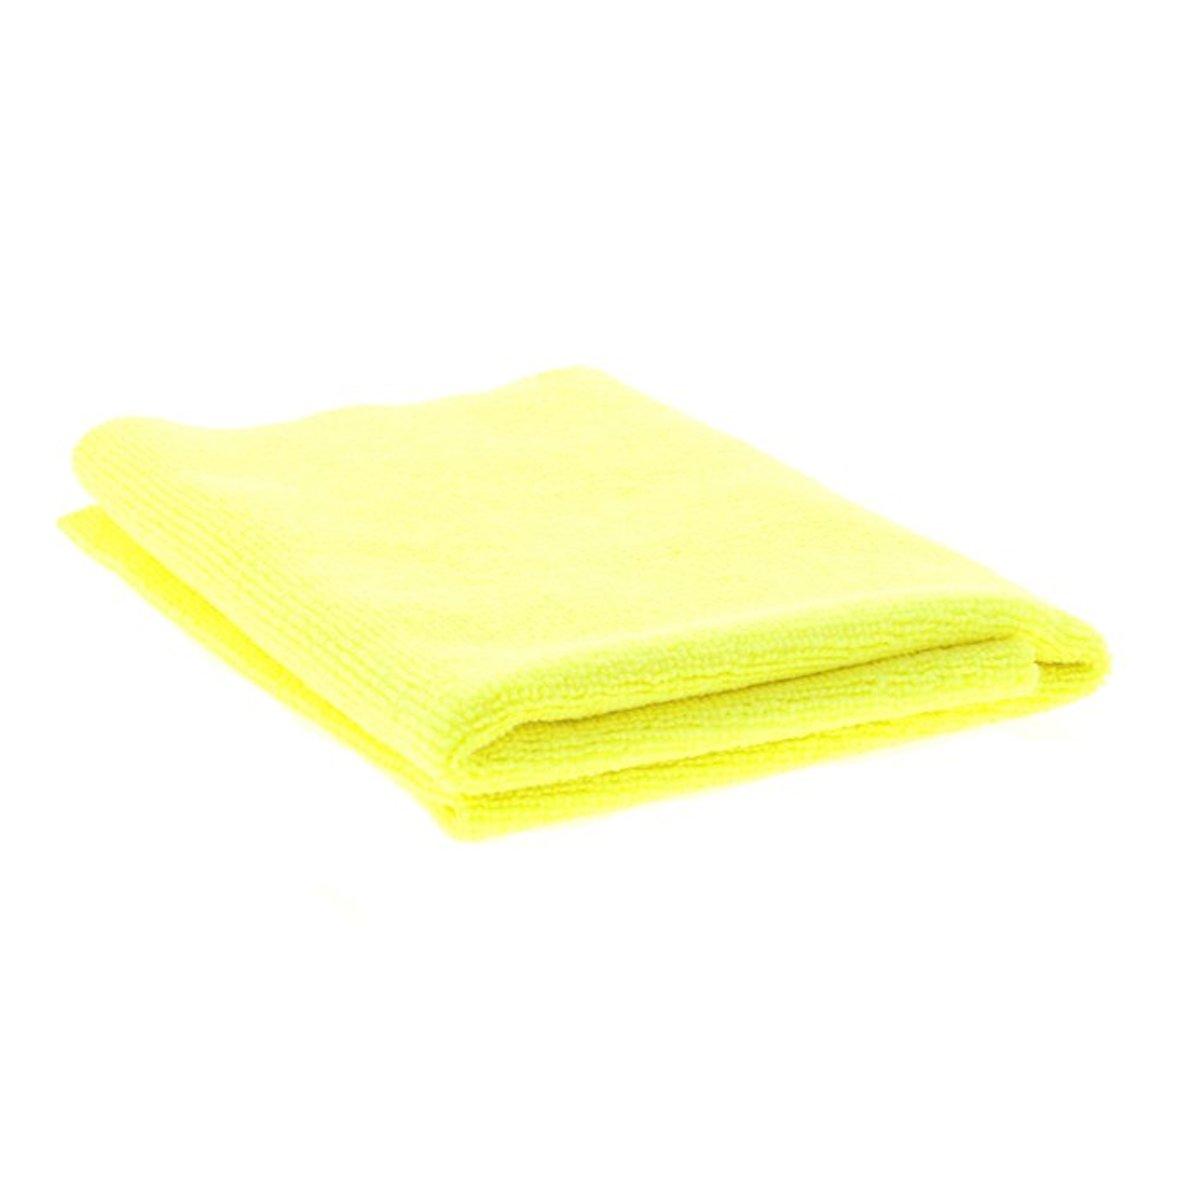 Microfiber Madness Yellow Fellow 2.0 Polish Removal Towel - 40x40cm kopen